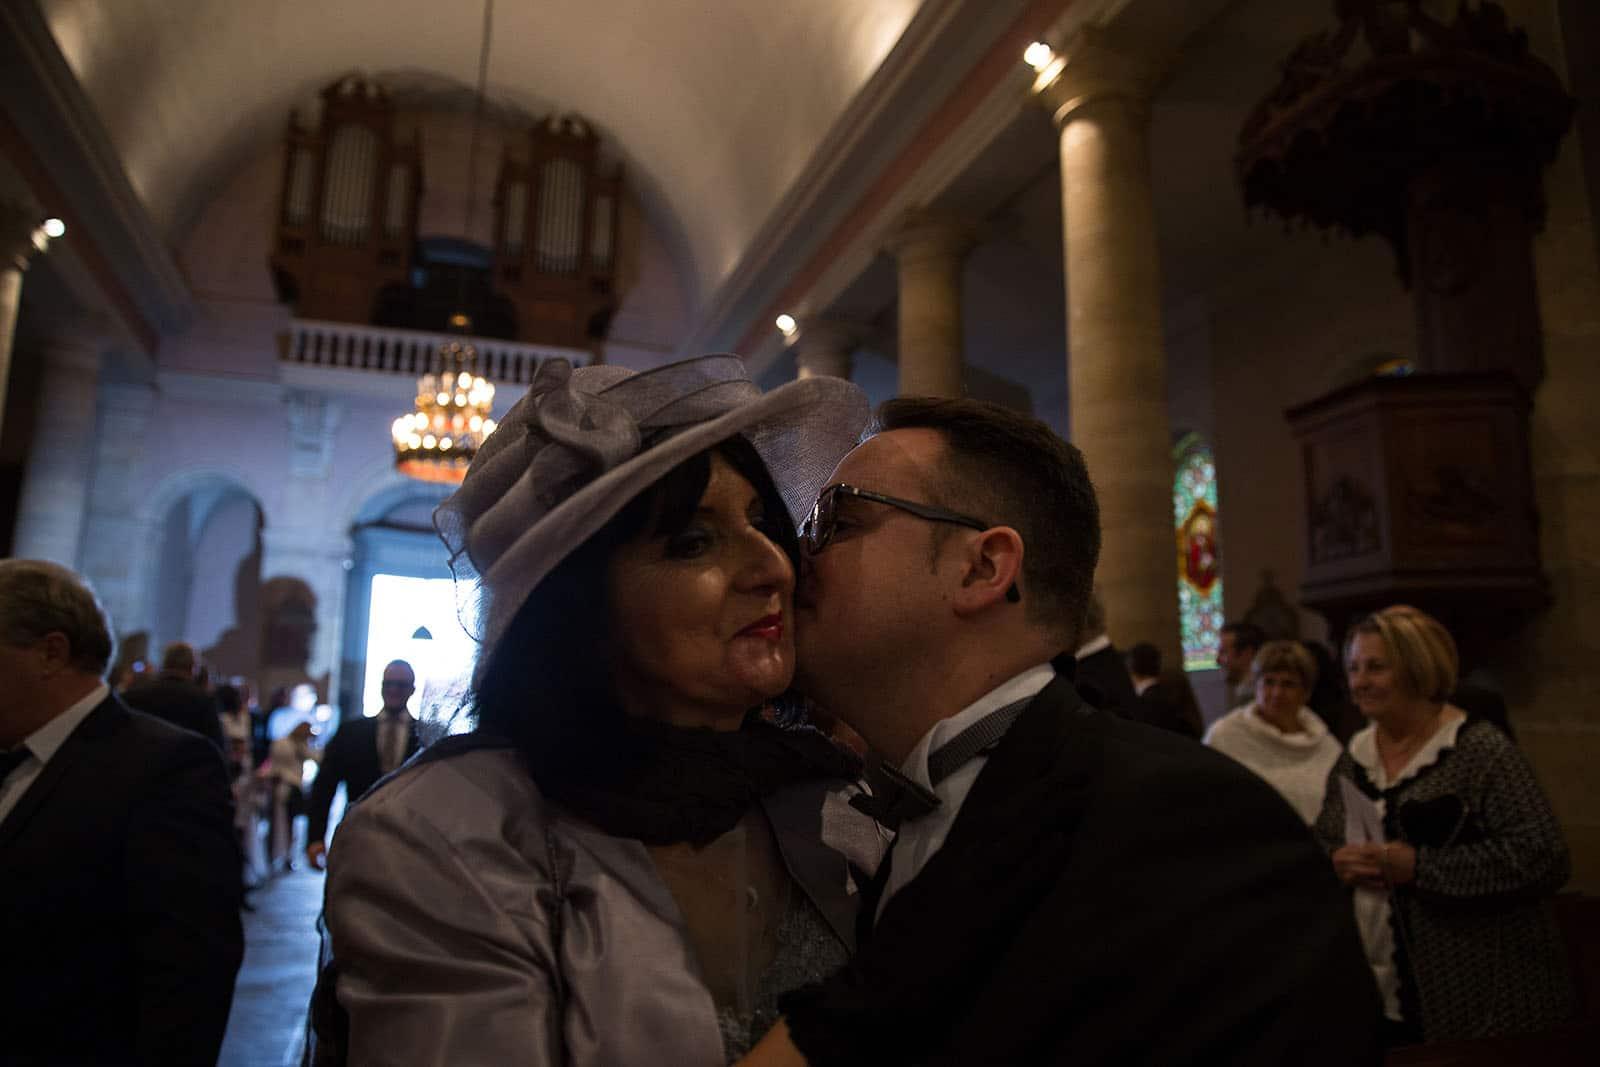 photographe de mariage chalon sur sane le mari embrasse sa mre photo ralise - Photographe Mariage Chalon Sur Saone